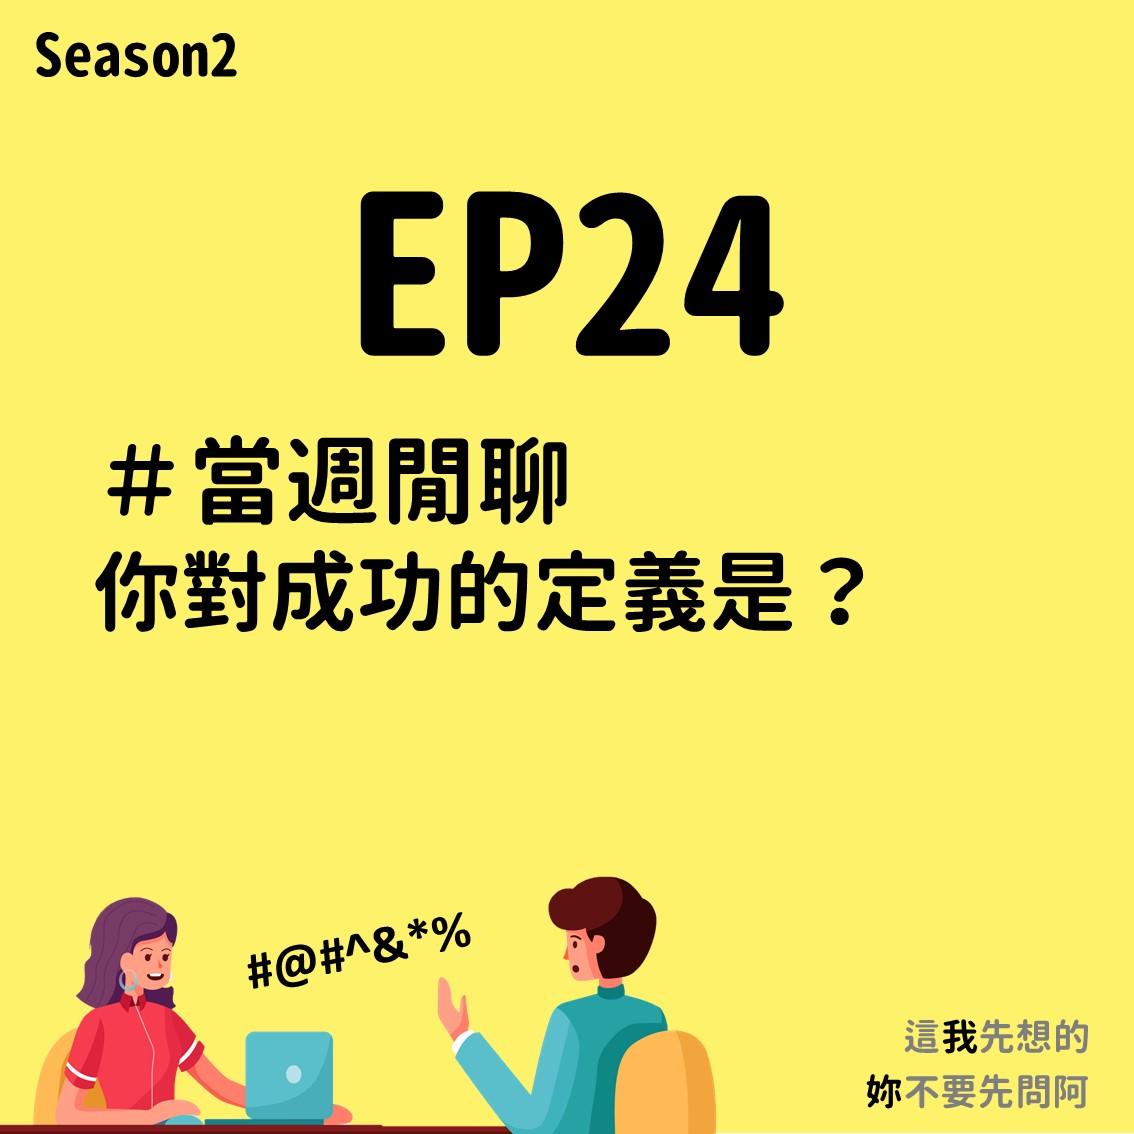 EP24 當週閒聊|你對成功的定義是?